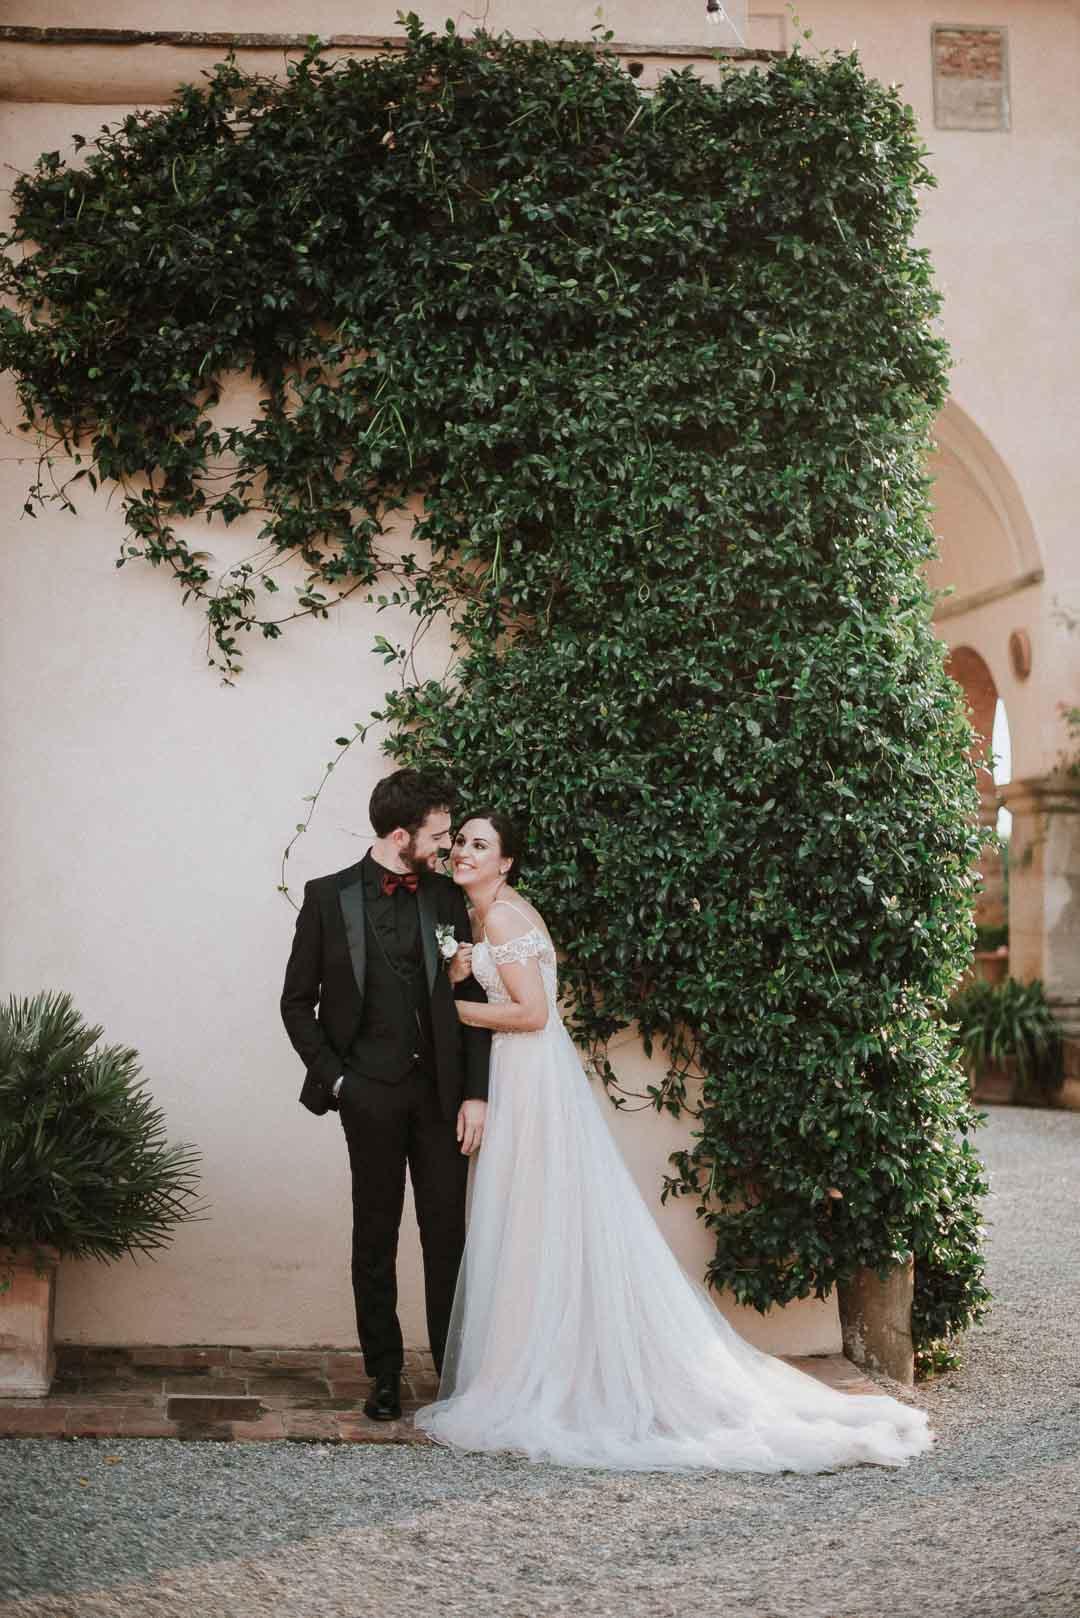 wedding-photographer-destination-fineart-bespoke-reportage-tuscany-villascorzi-vivianeizzo-spazio46-105